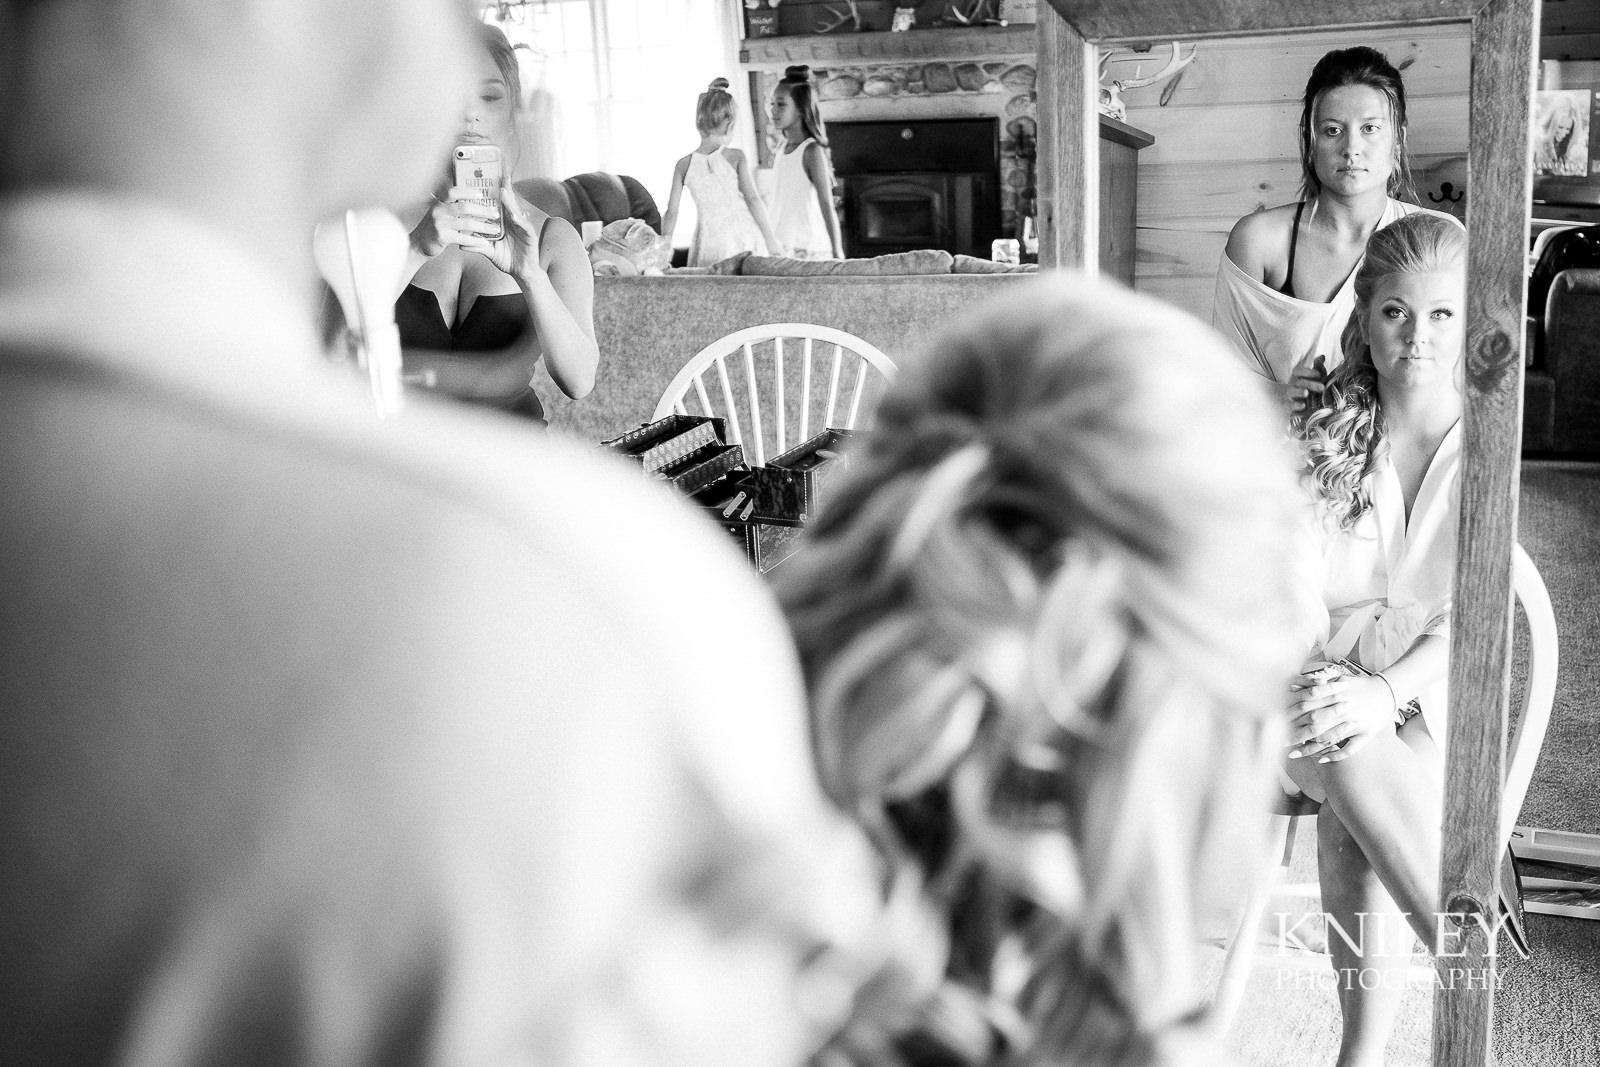 022 - Buffalo NY wedding - Preparation pictures - XT2A6626.jpg